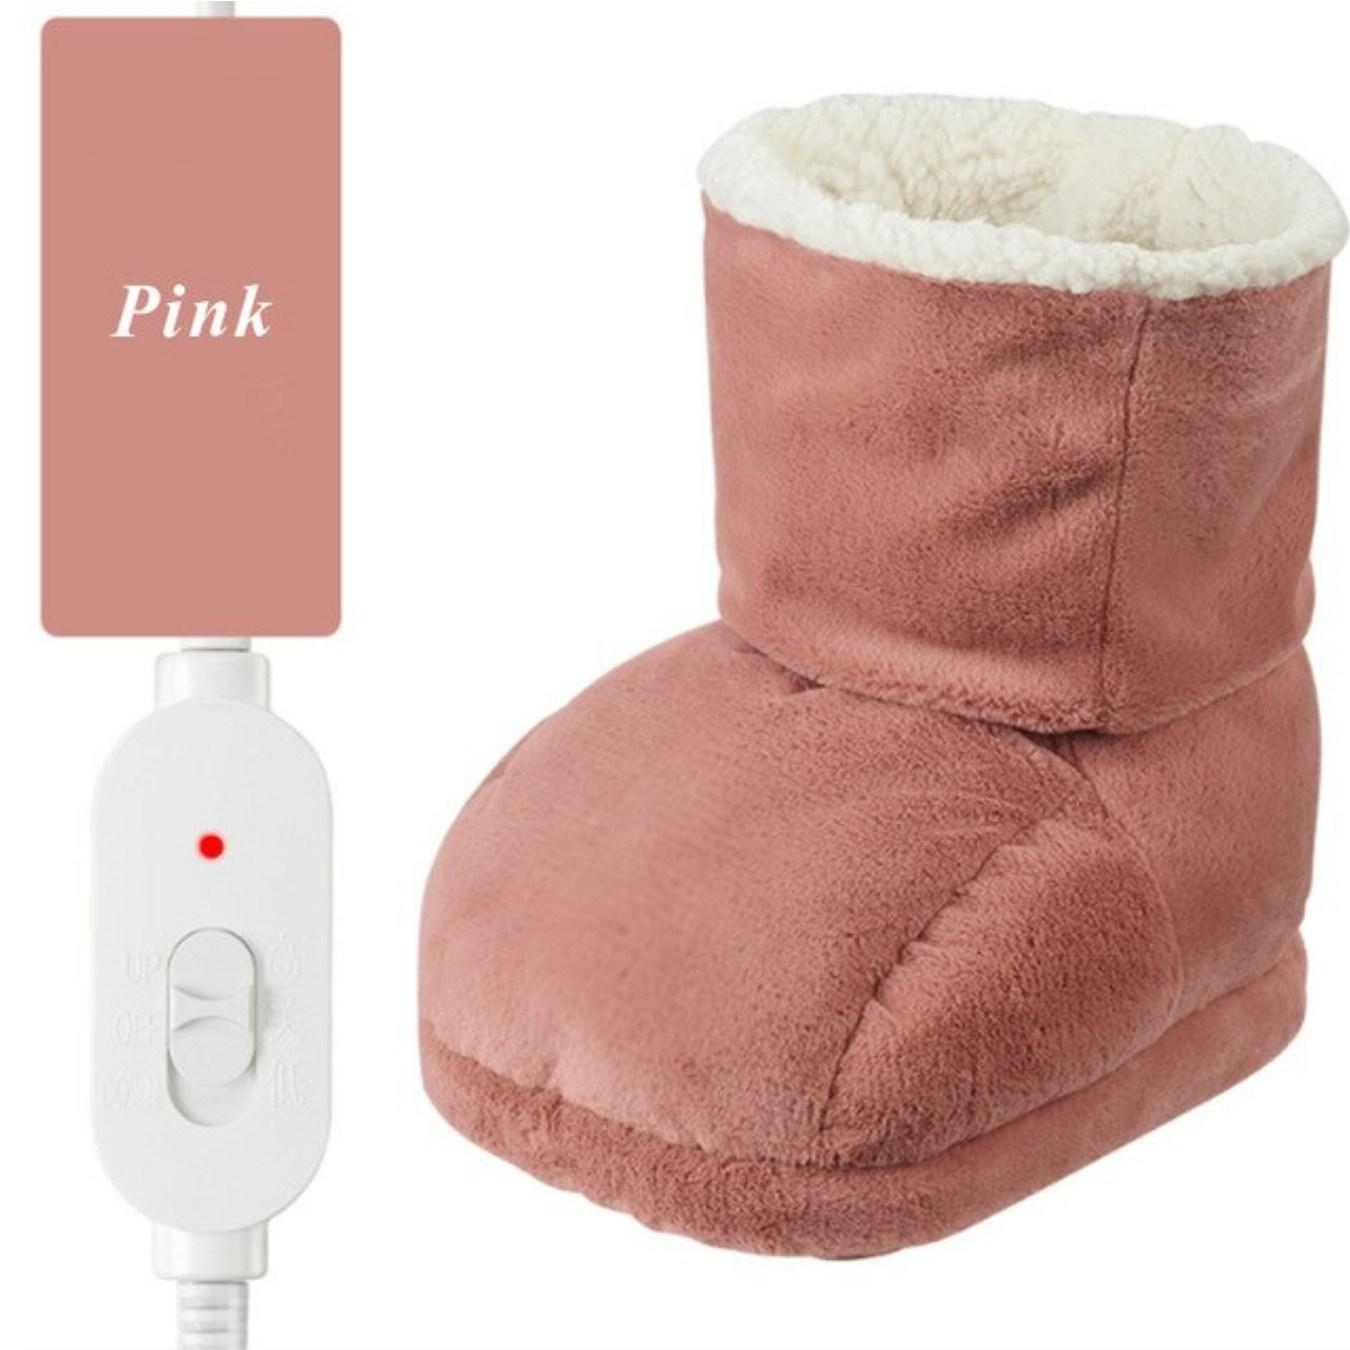 A9 발온열기 풋워머 발찜질기 전기 사무실 발난로, Pink